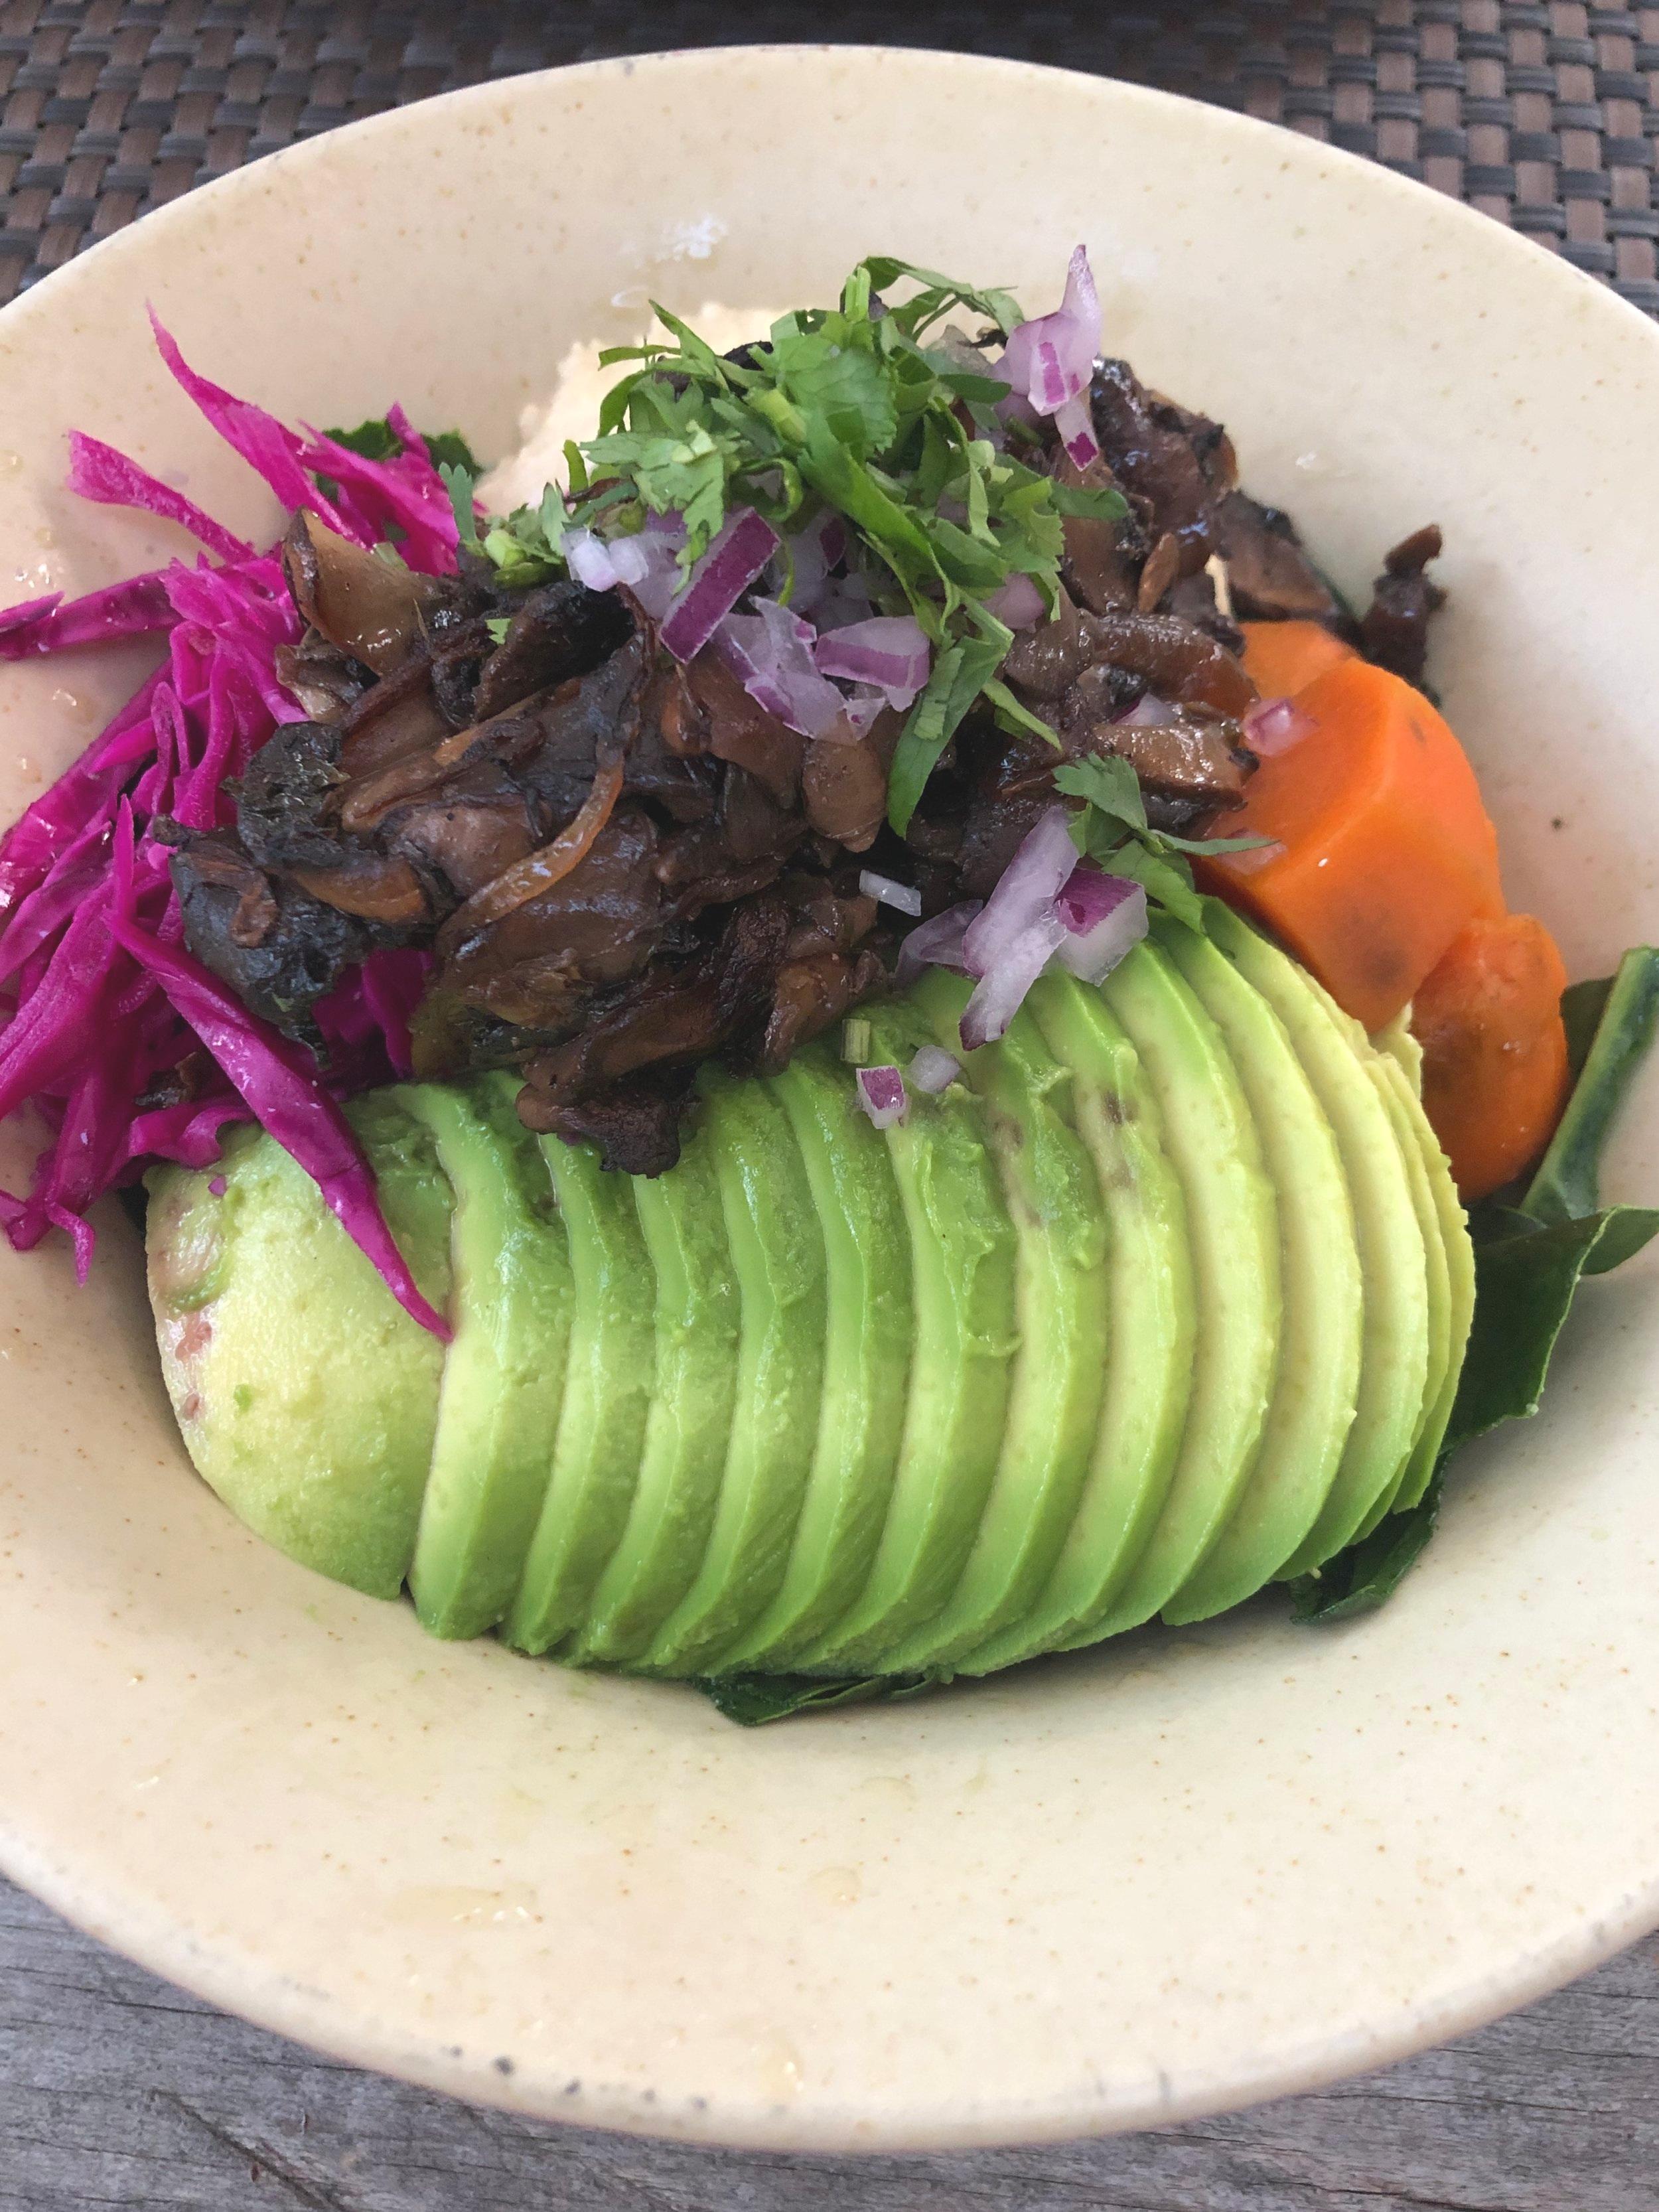 Craving veggies - salad from Charly's Vegan Tacos